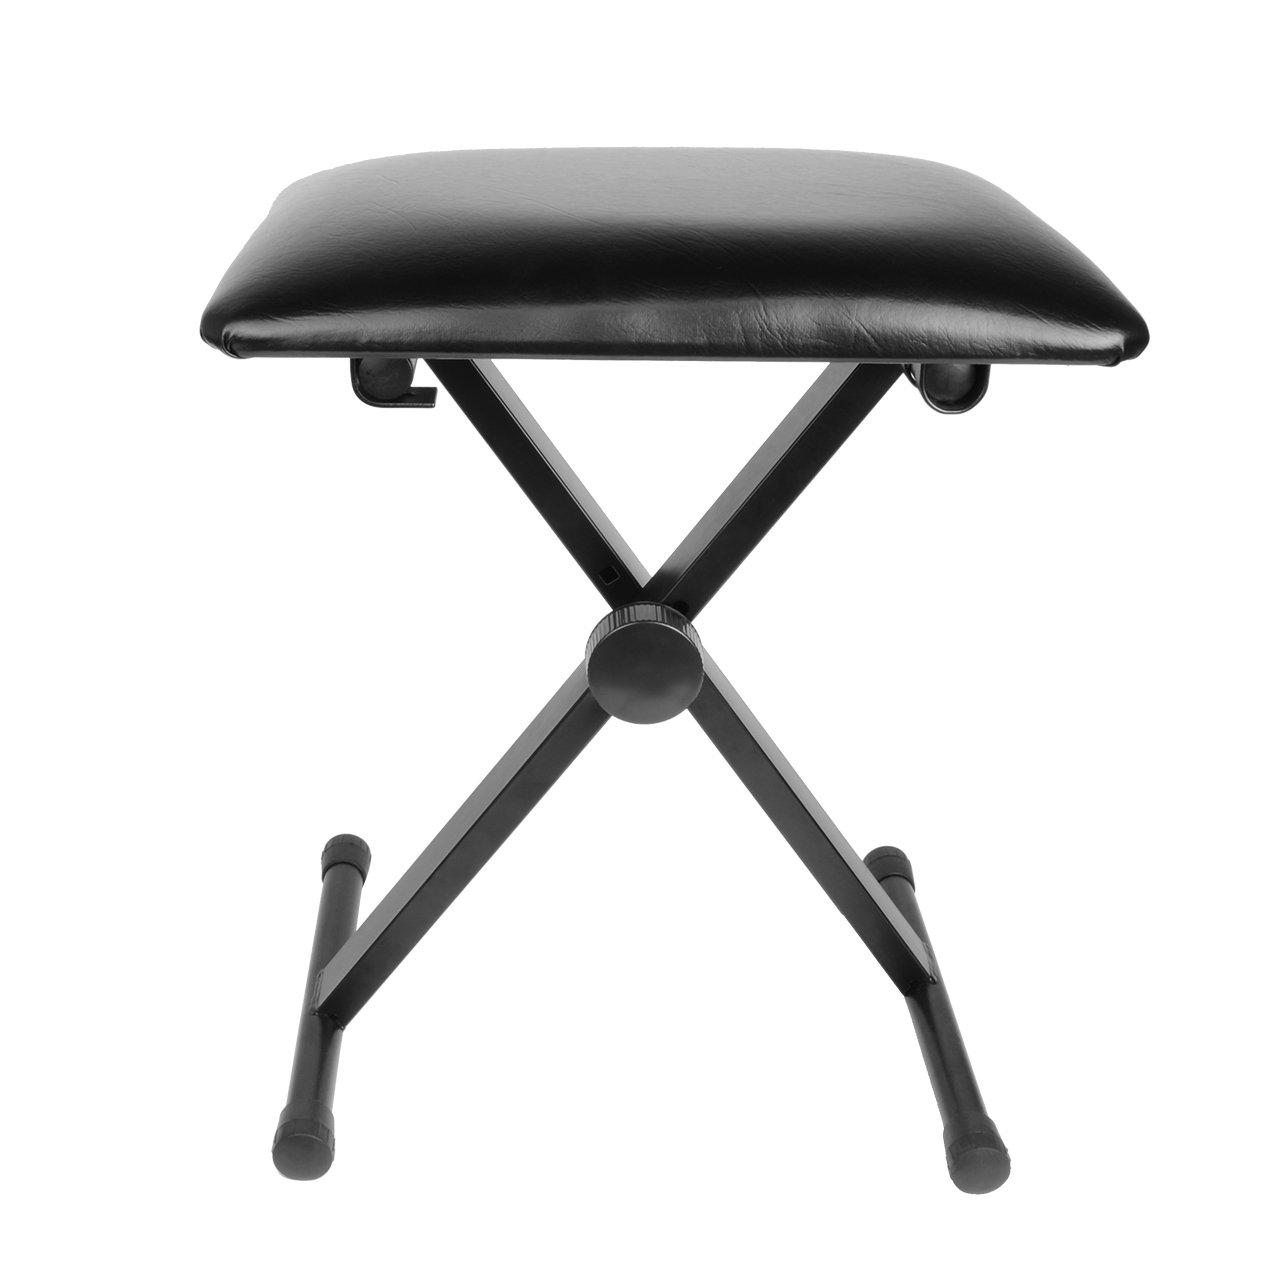 SaveOnMany ® Adjustable Padded Piano Keyboard Bench Seat W/ Rubber Feet Stool X style Folding Chair GZA-00514